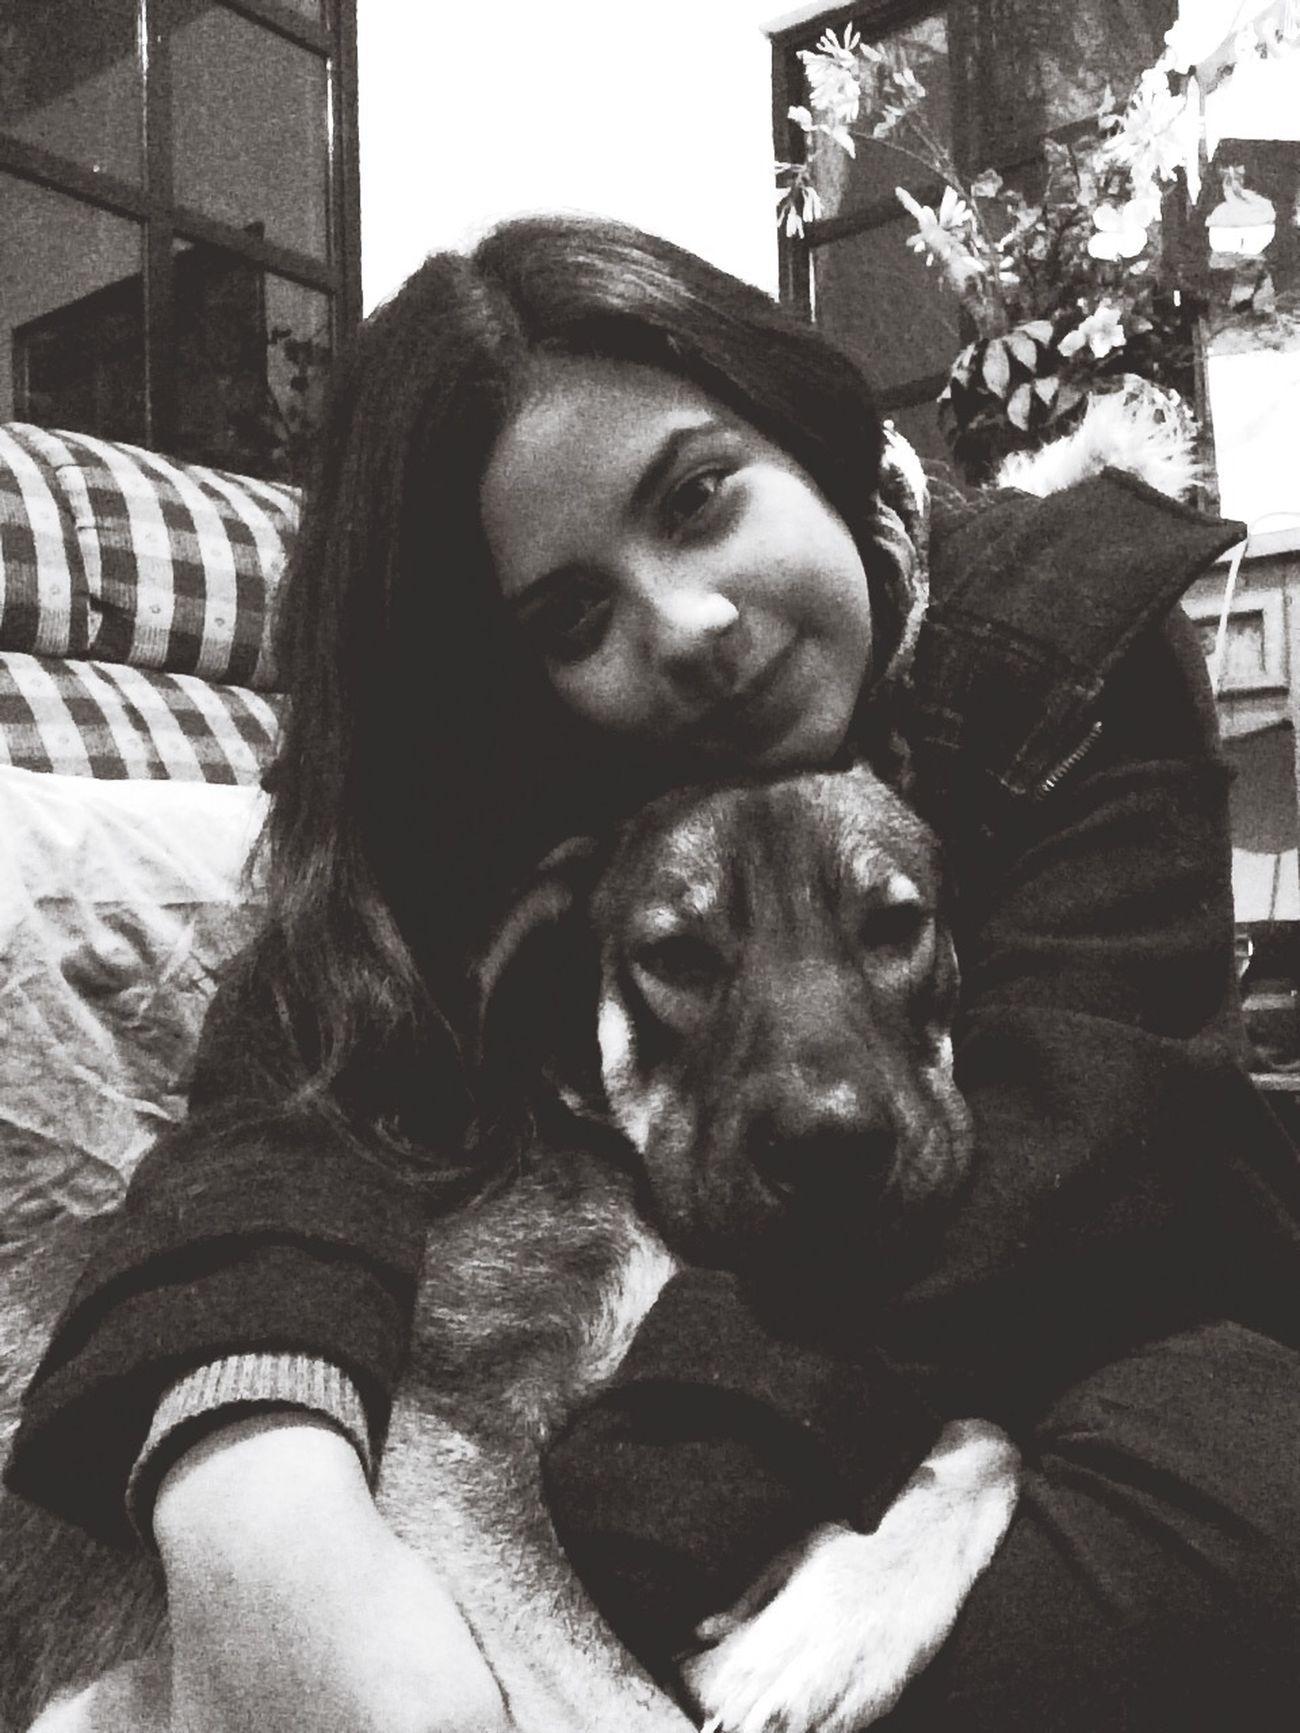 Youaremylove Ilovemydog Happydog Dog Truelove INeverWannaLetYouGo.. You Are Not Alone youcandoit